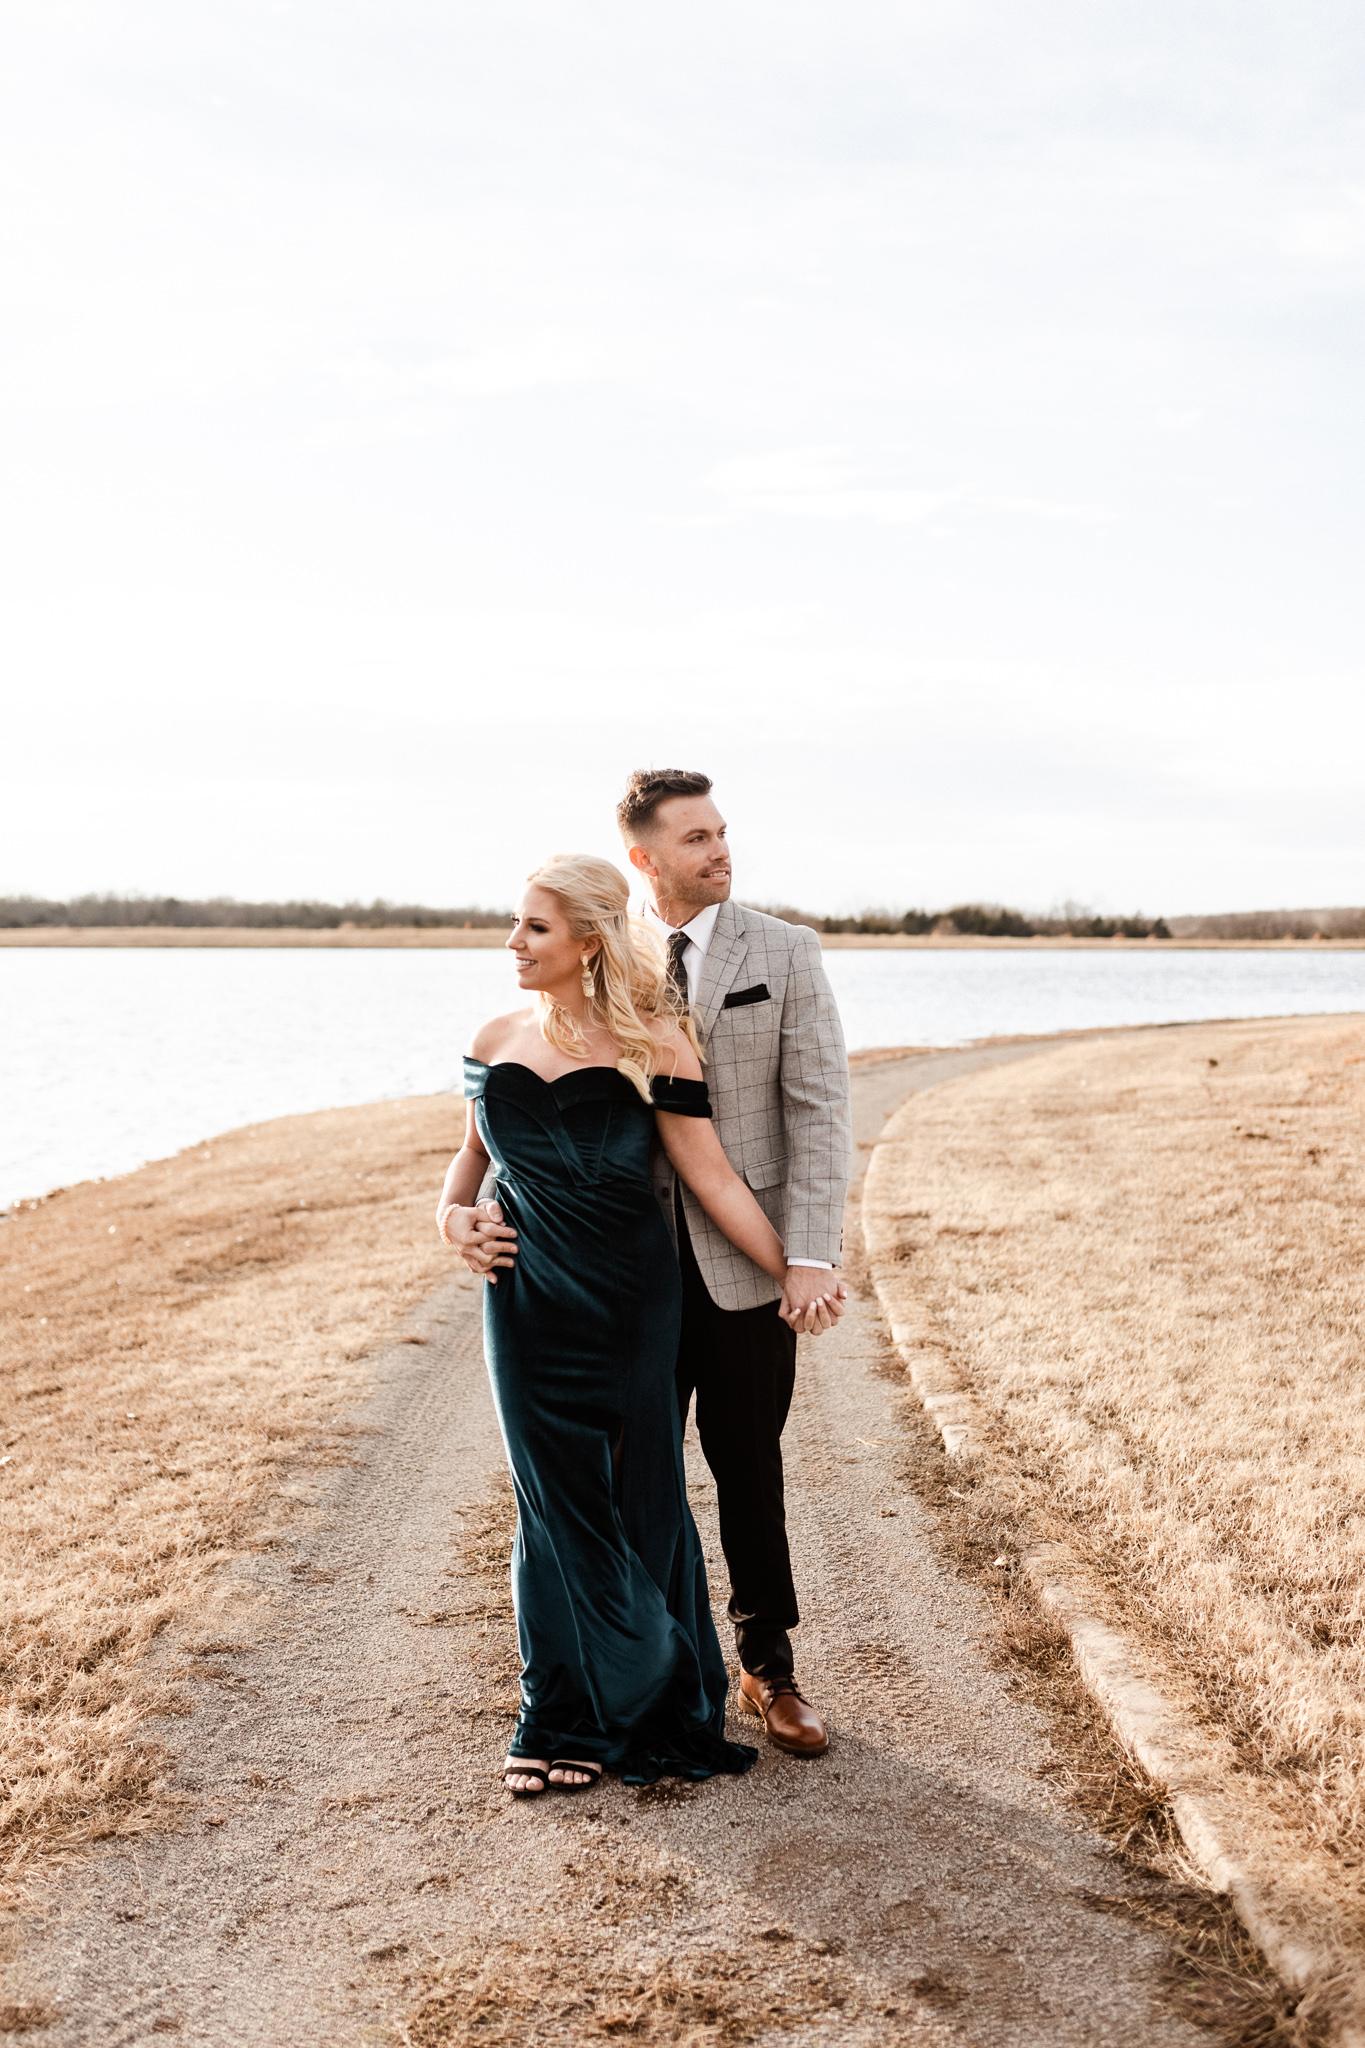 Wade + Stephanie | Warm Open Field Engagements | Oklahoma Wedding Photographer-36.jpg